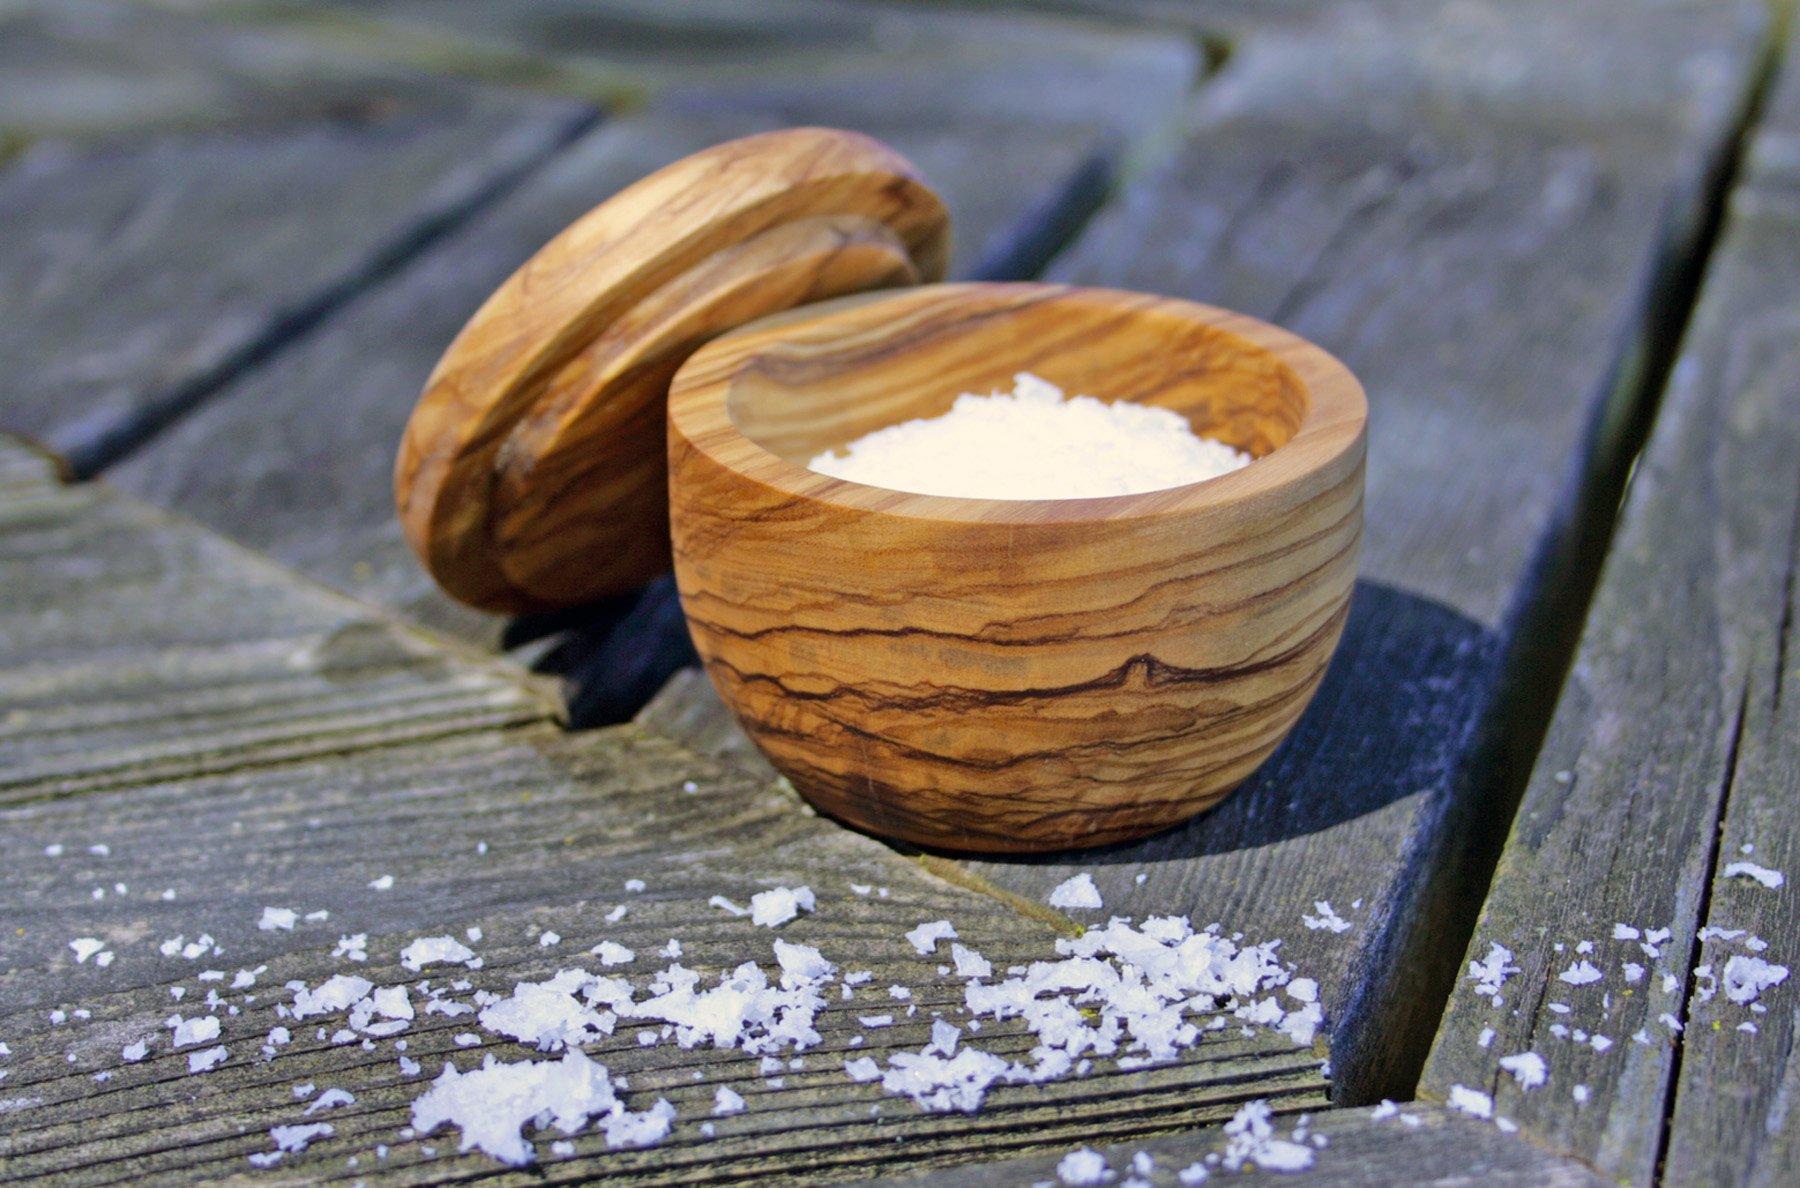 Swissmar Napoli Salt Keeper with Removable Lid, Olive Wood by Swissmar (Image #2)